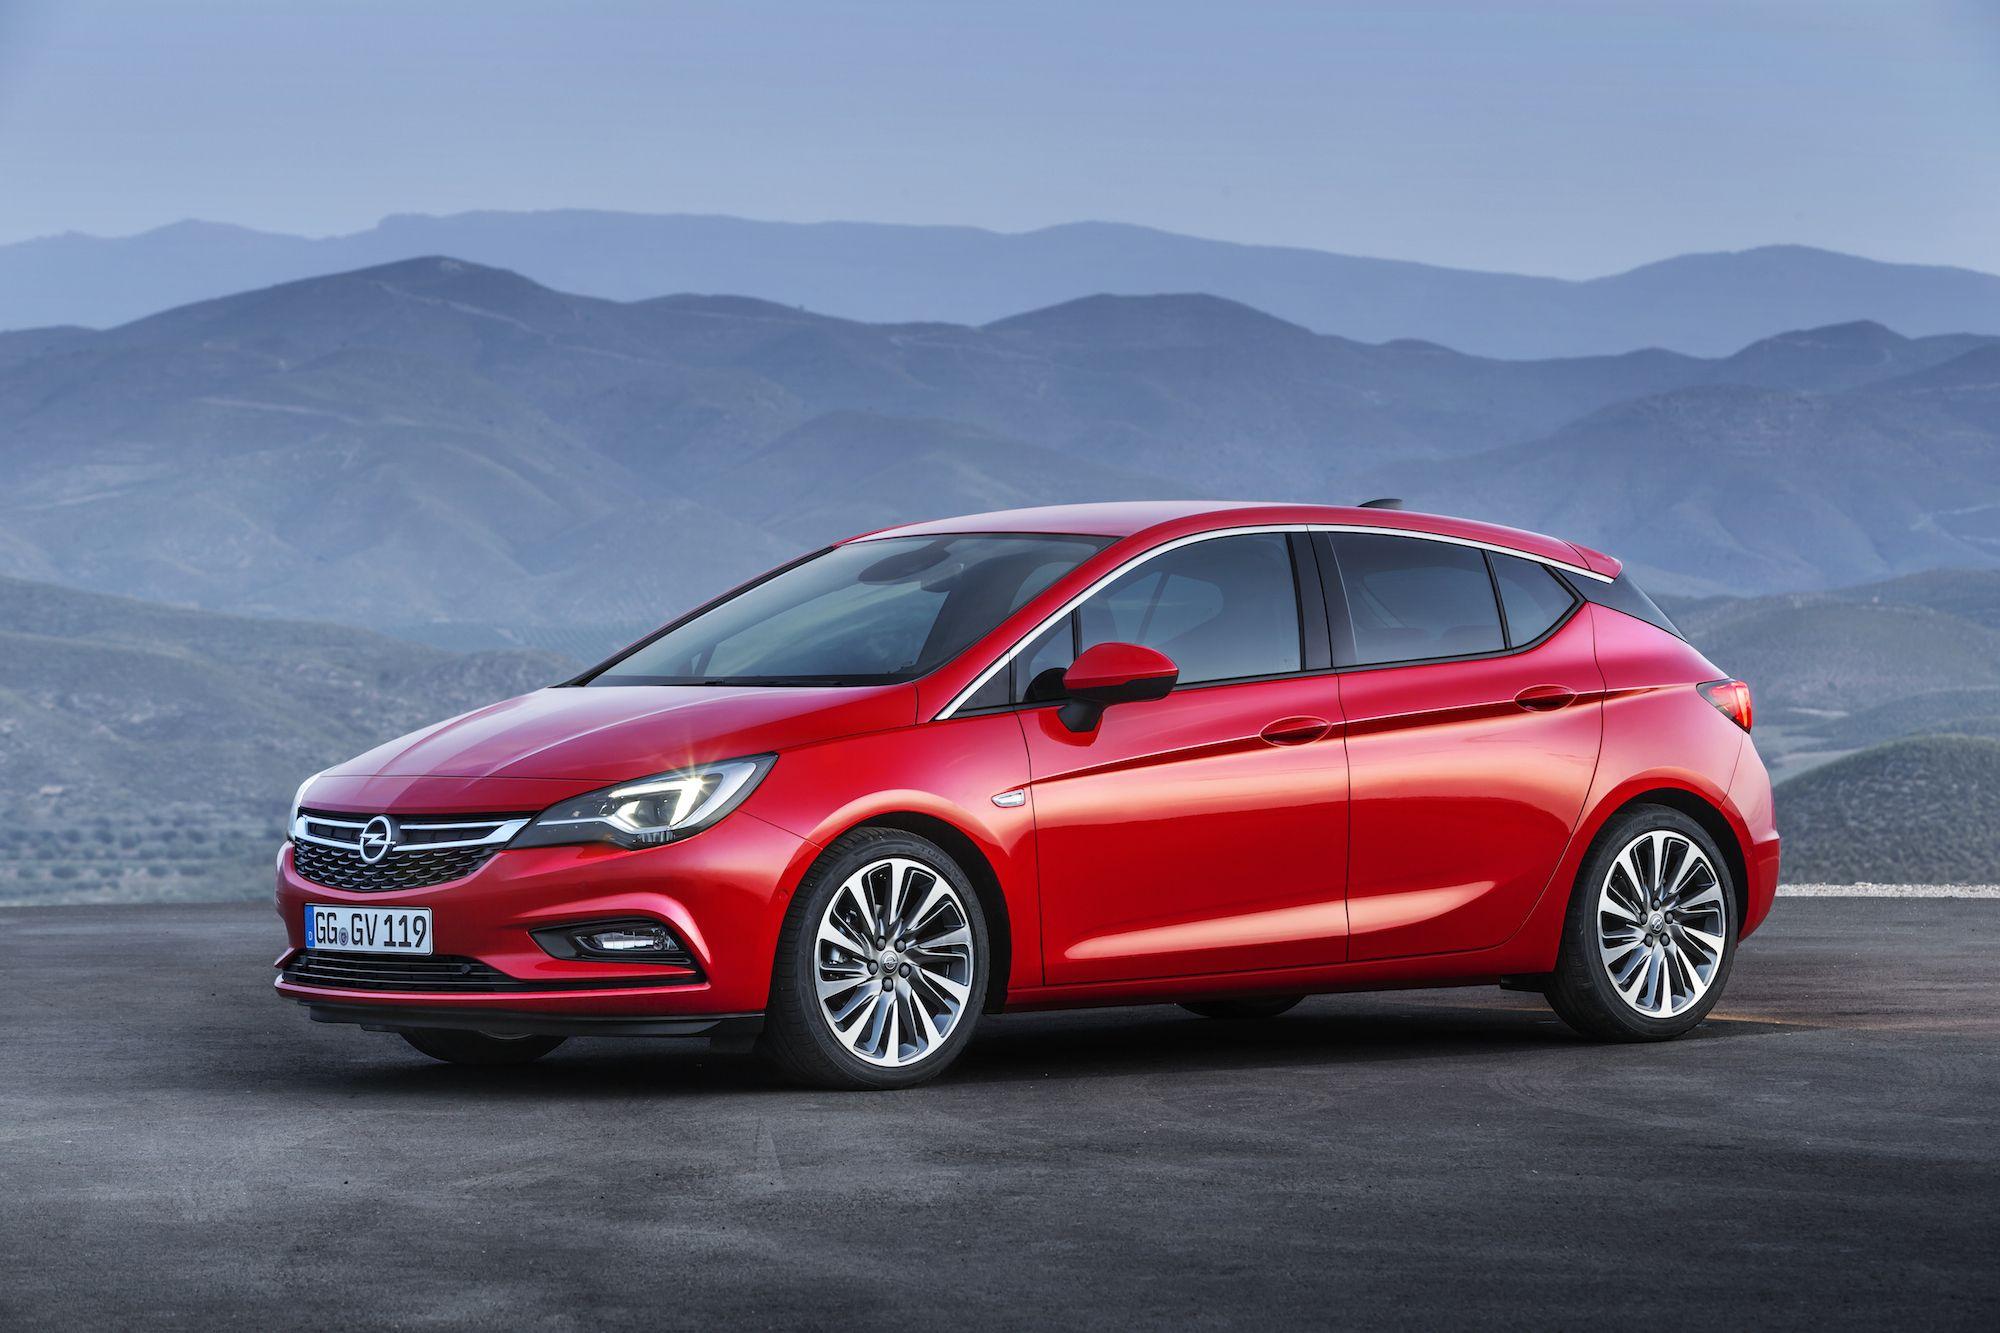 All New 2016 Opel Astra Revealed Ahead Of Frankfurt Motor Show Hatchback Opel New Cars